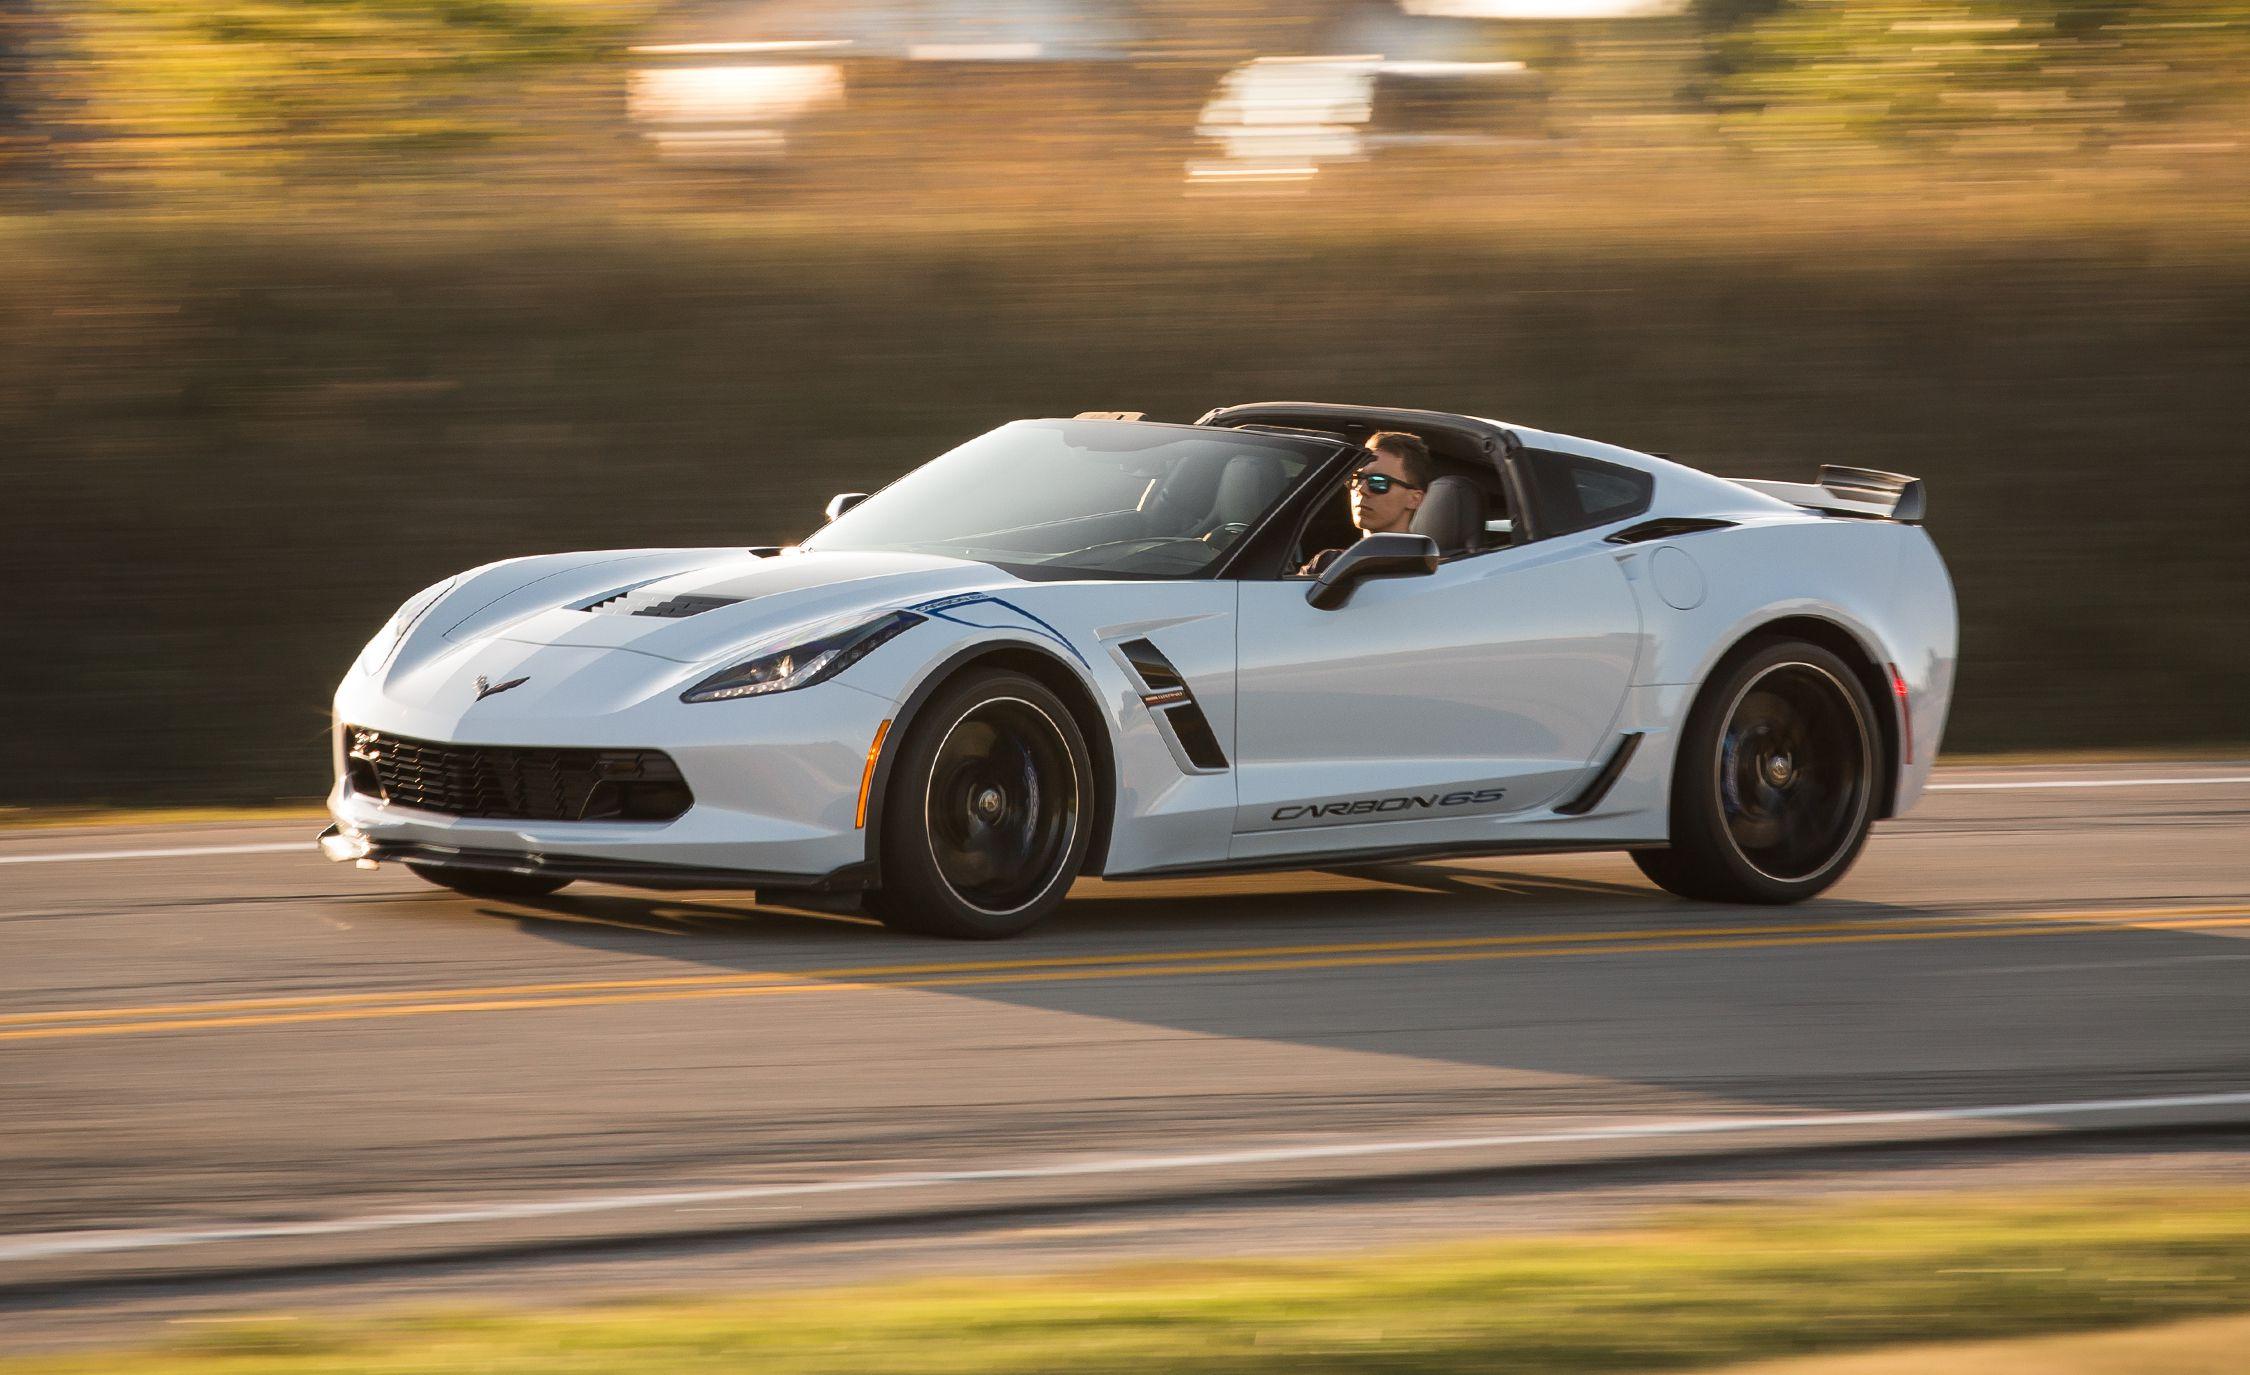 2018 Chevrolet Corvette Grand Sport | Review | Car and Driver